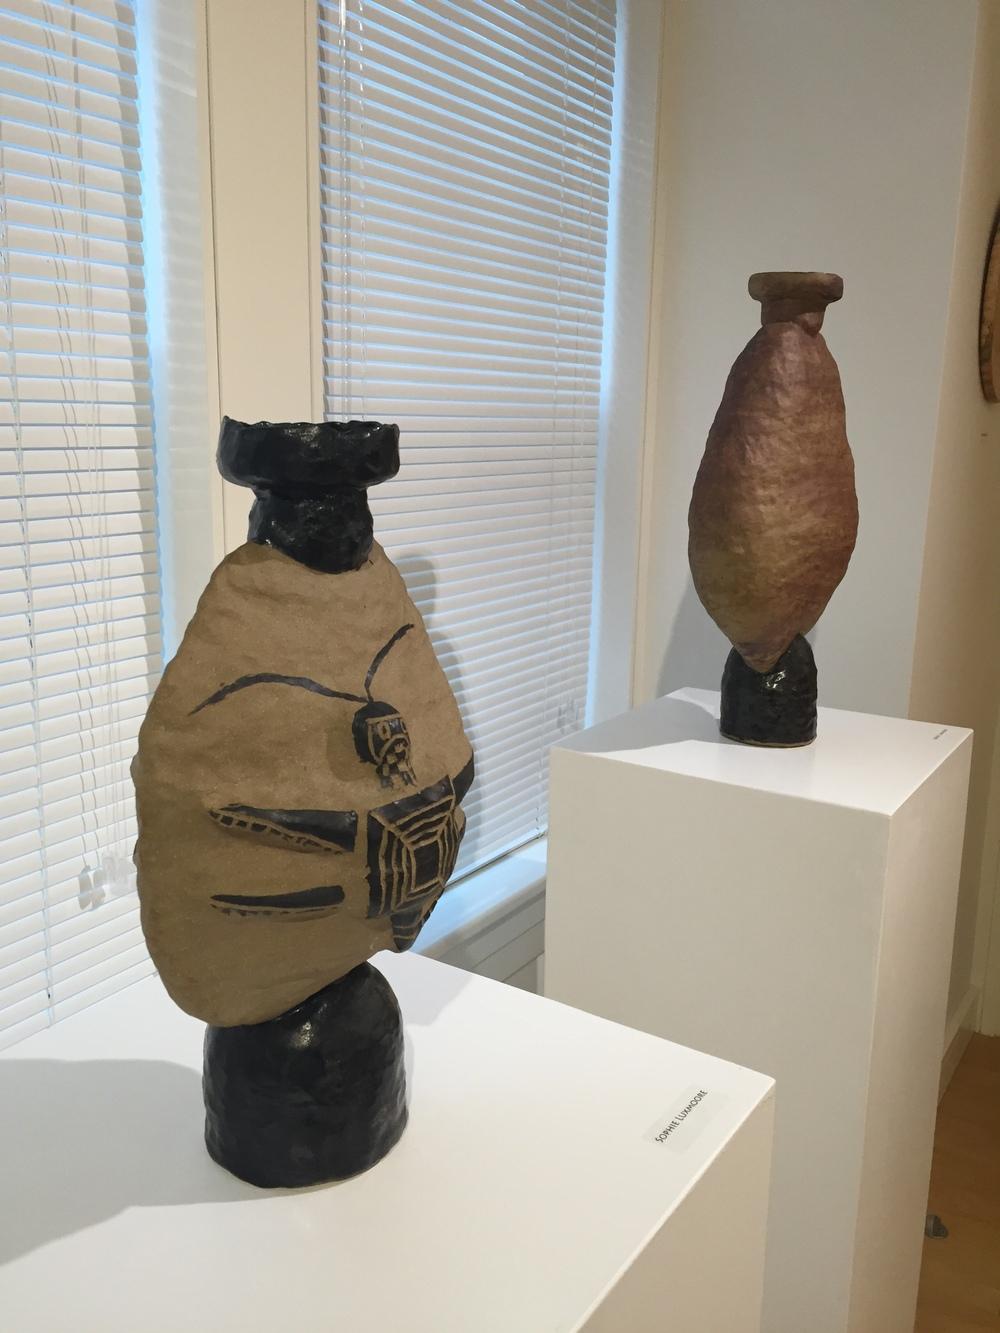 Faculty art work in the Putnam Gallery